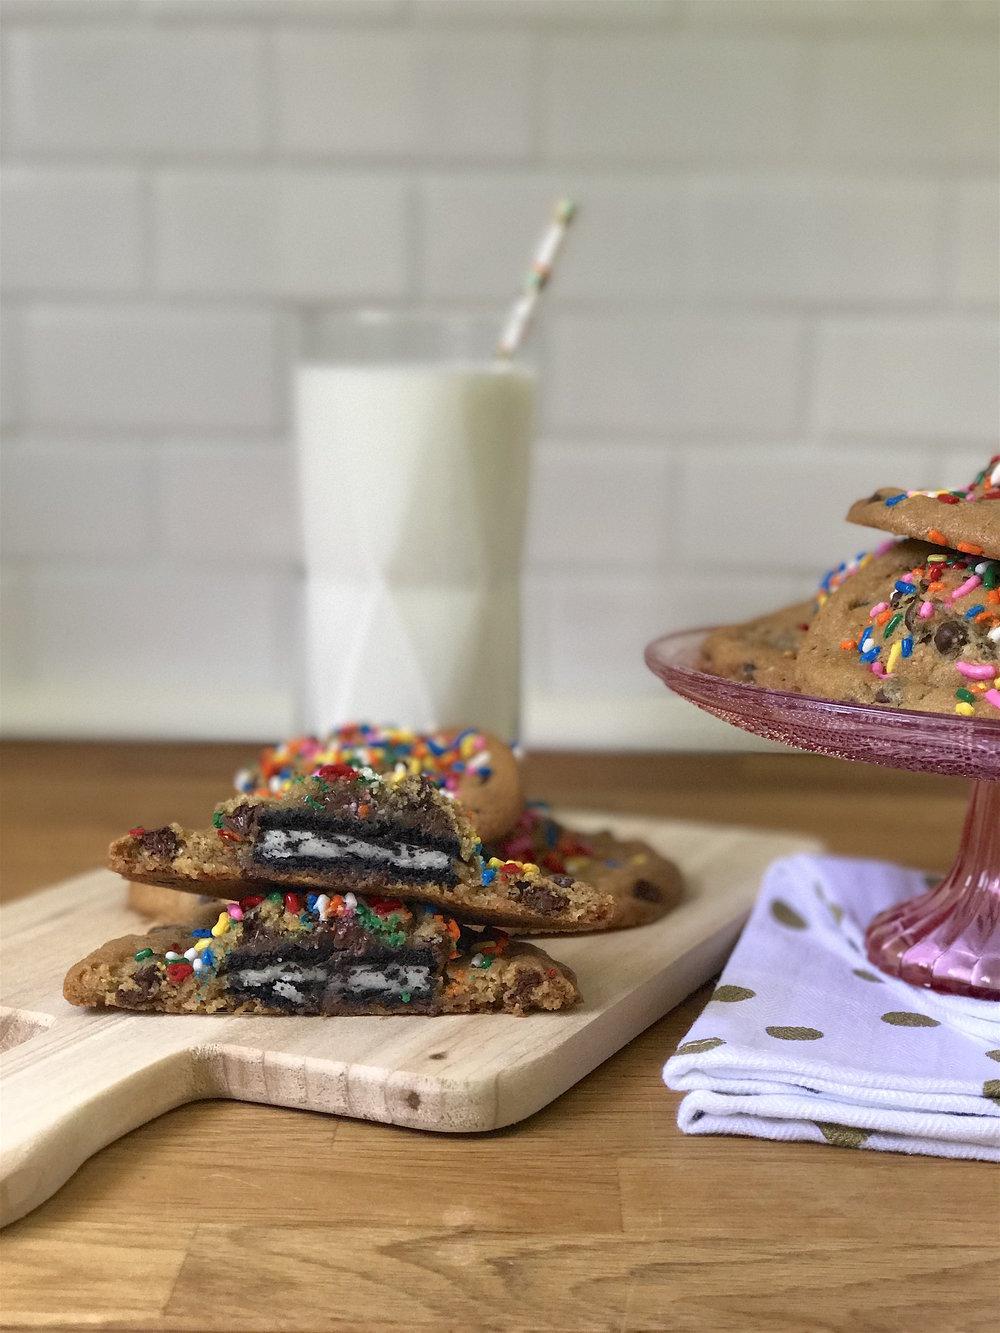 Boss+Babe+Club+Oreo+Stuffed+Cookies+Recipe